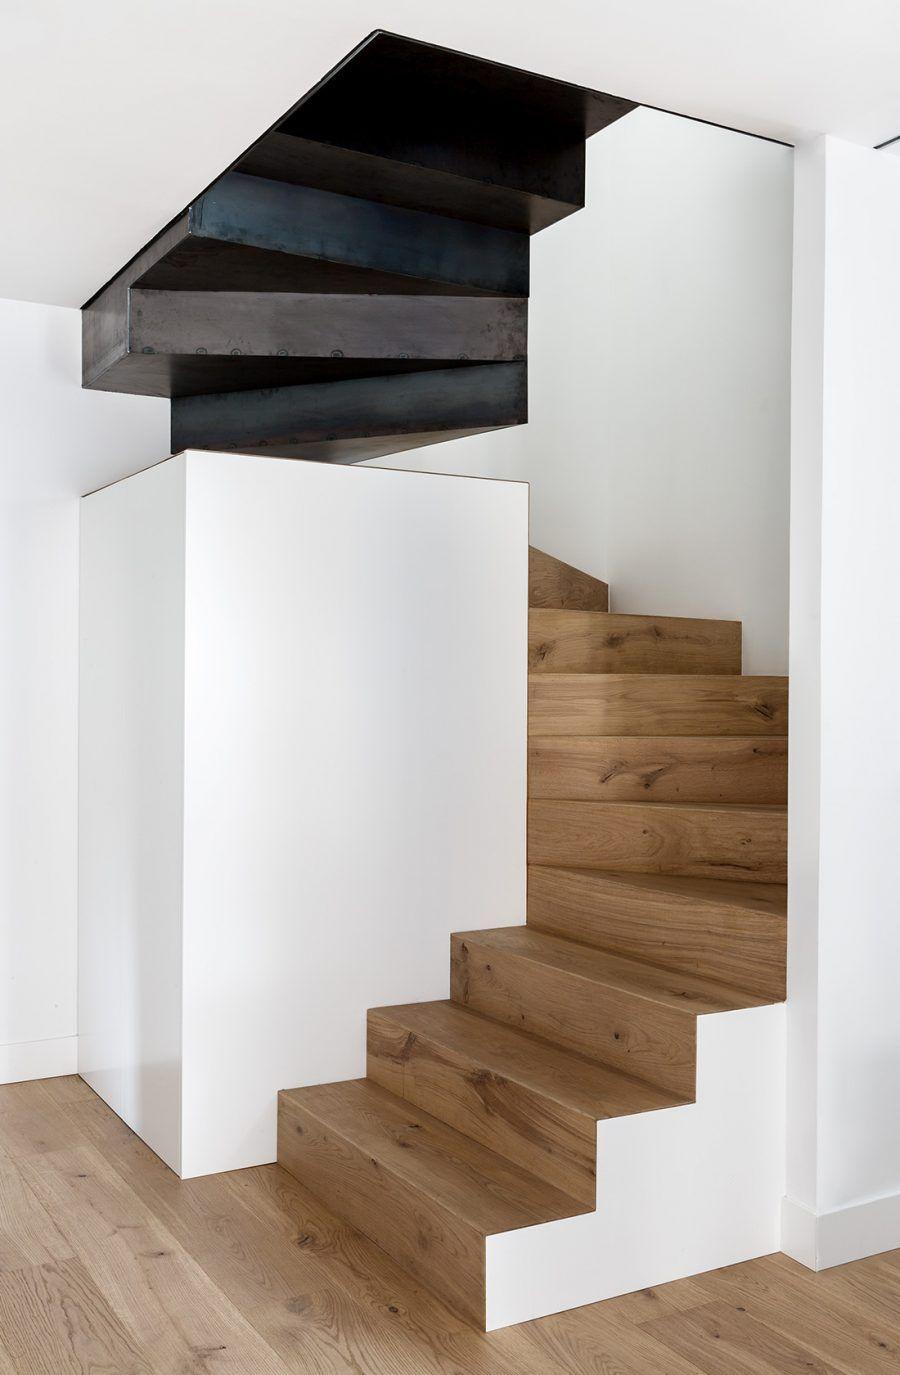 La Renovation D Un Appartement En Duplex Par Le Studio De Design Abaton Diseno De Escaleras Interiores Diseno De Escalera Escaleras Interiores